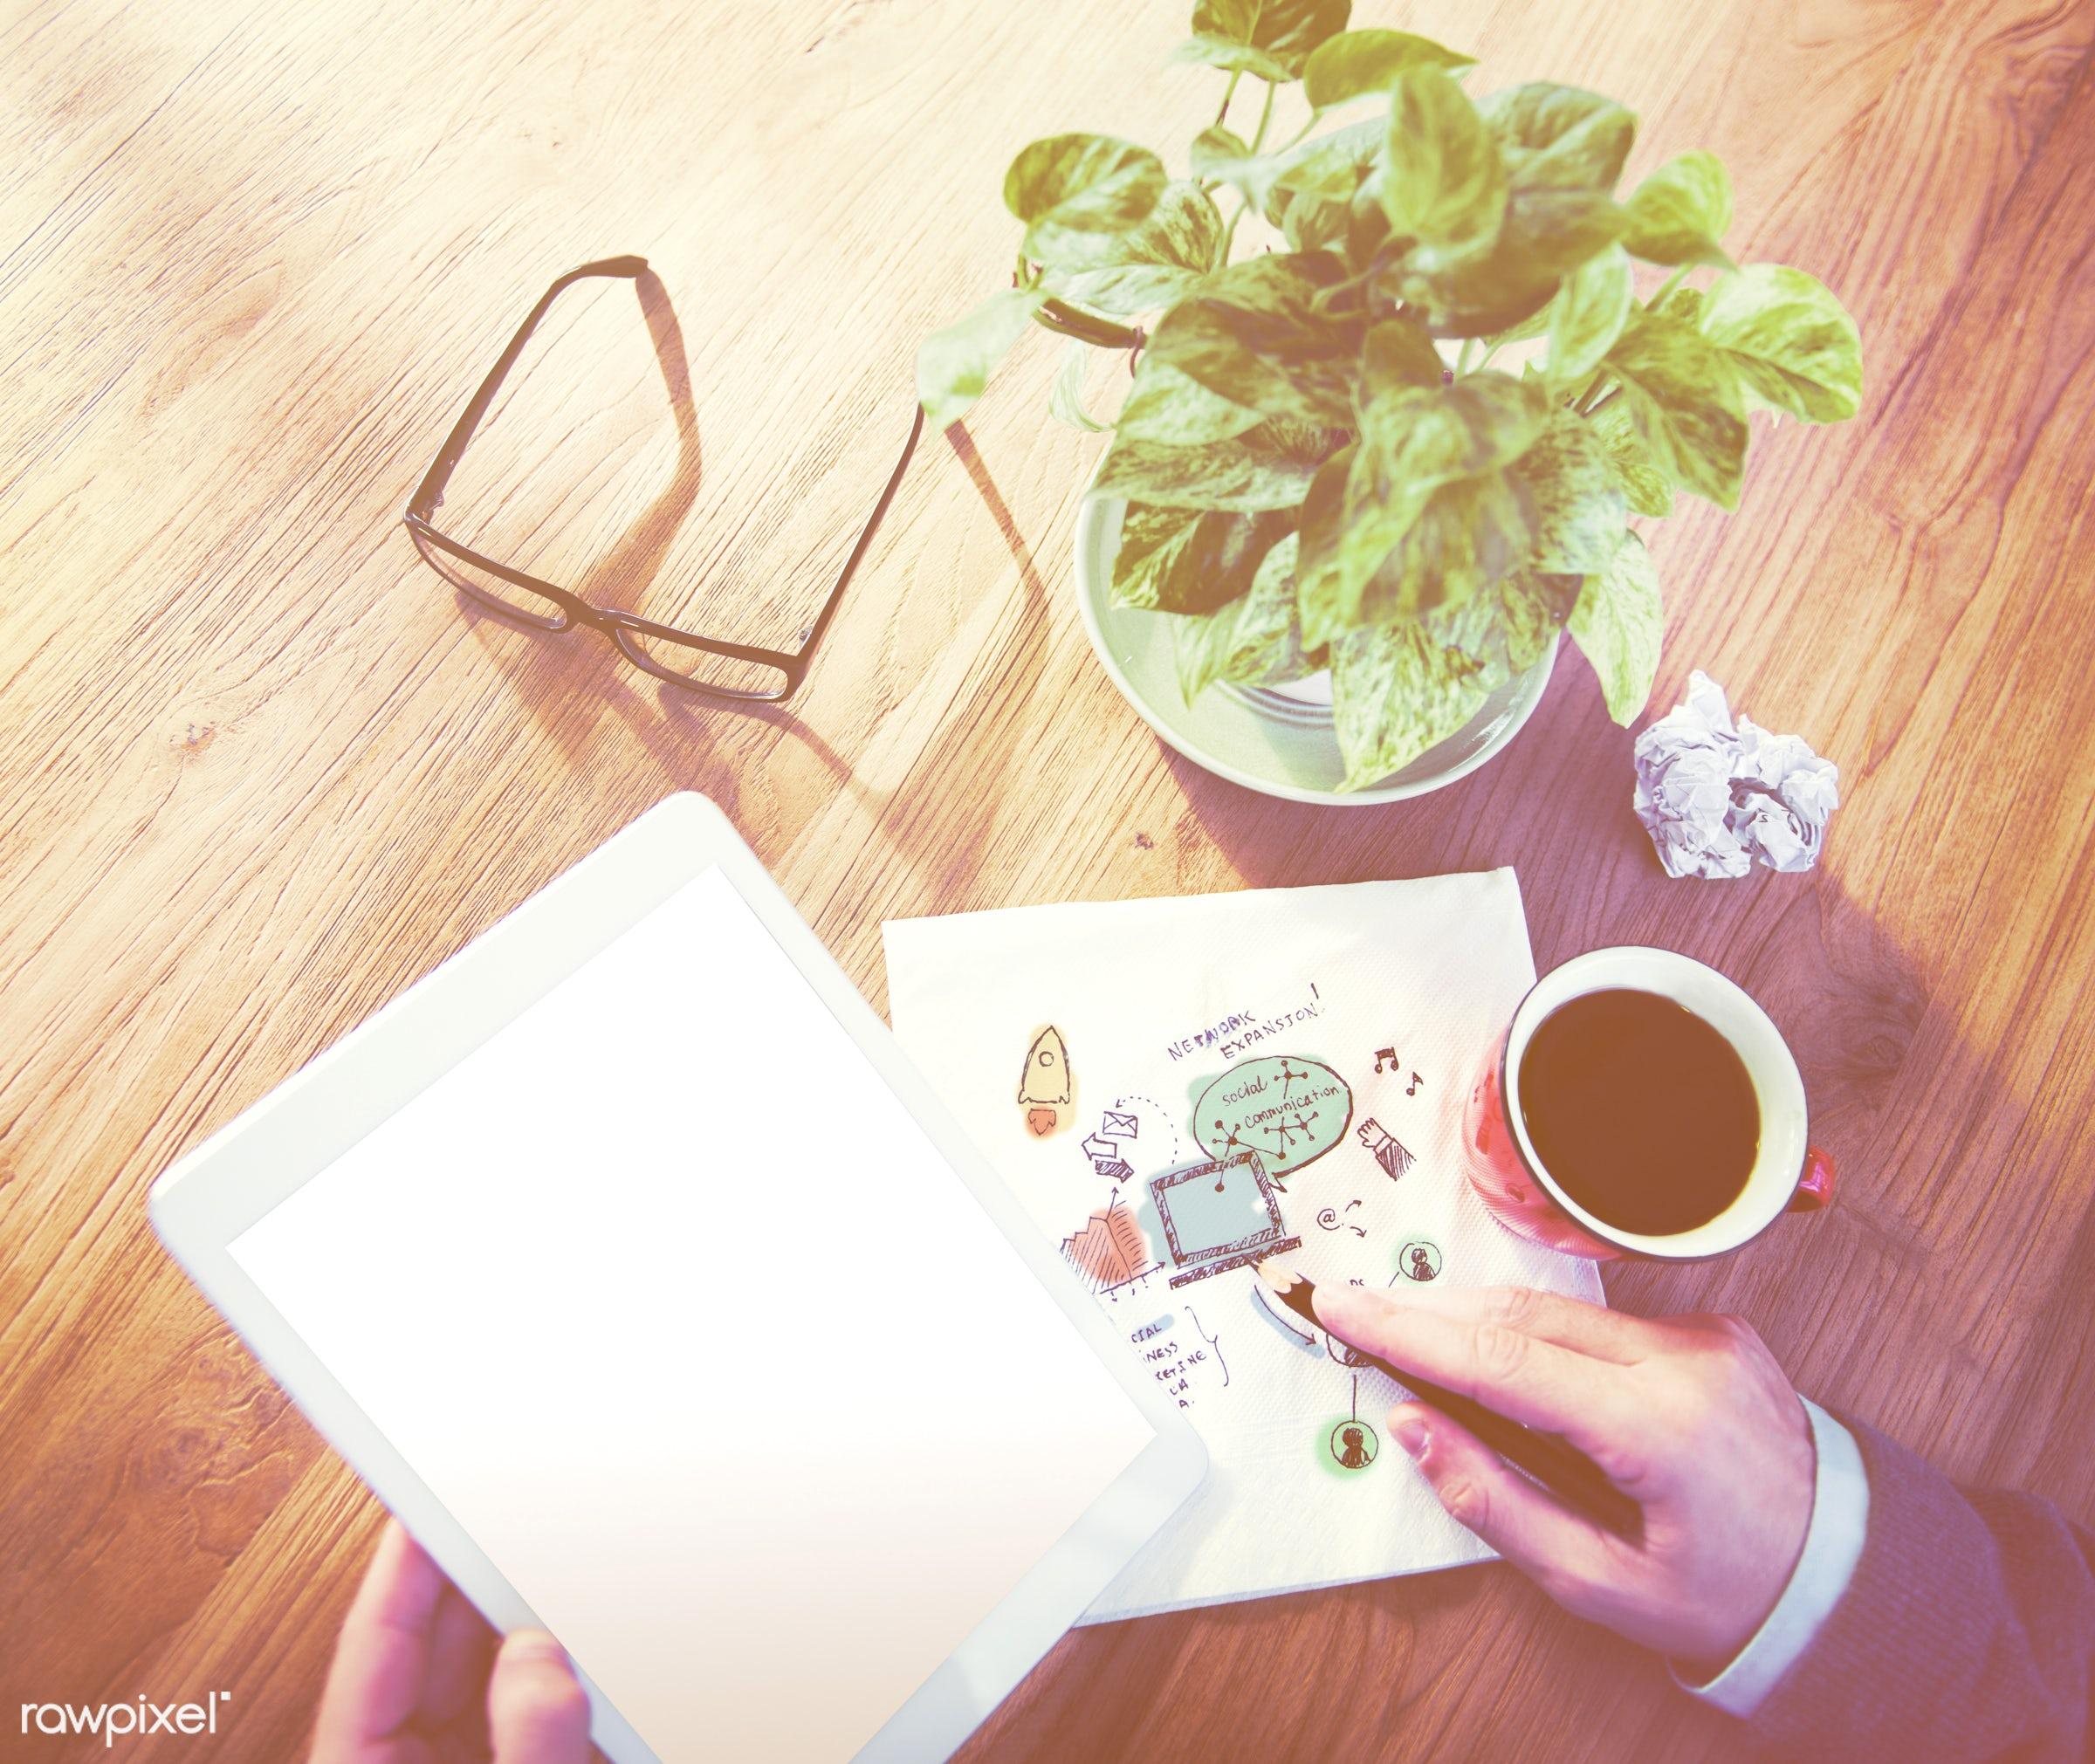 analysing, browsing, business, businessman, college, designer, desk, device, digital device, digital tablet, electronic...